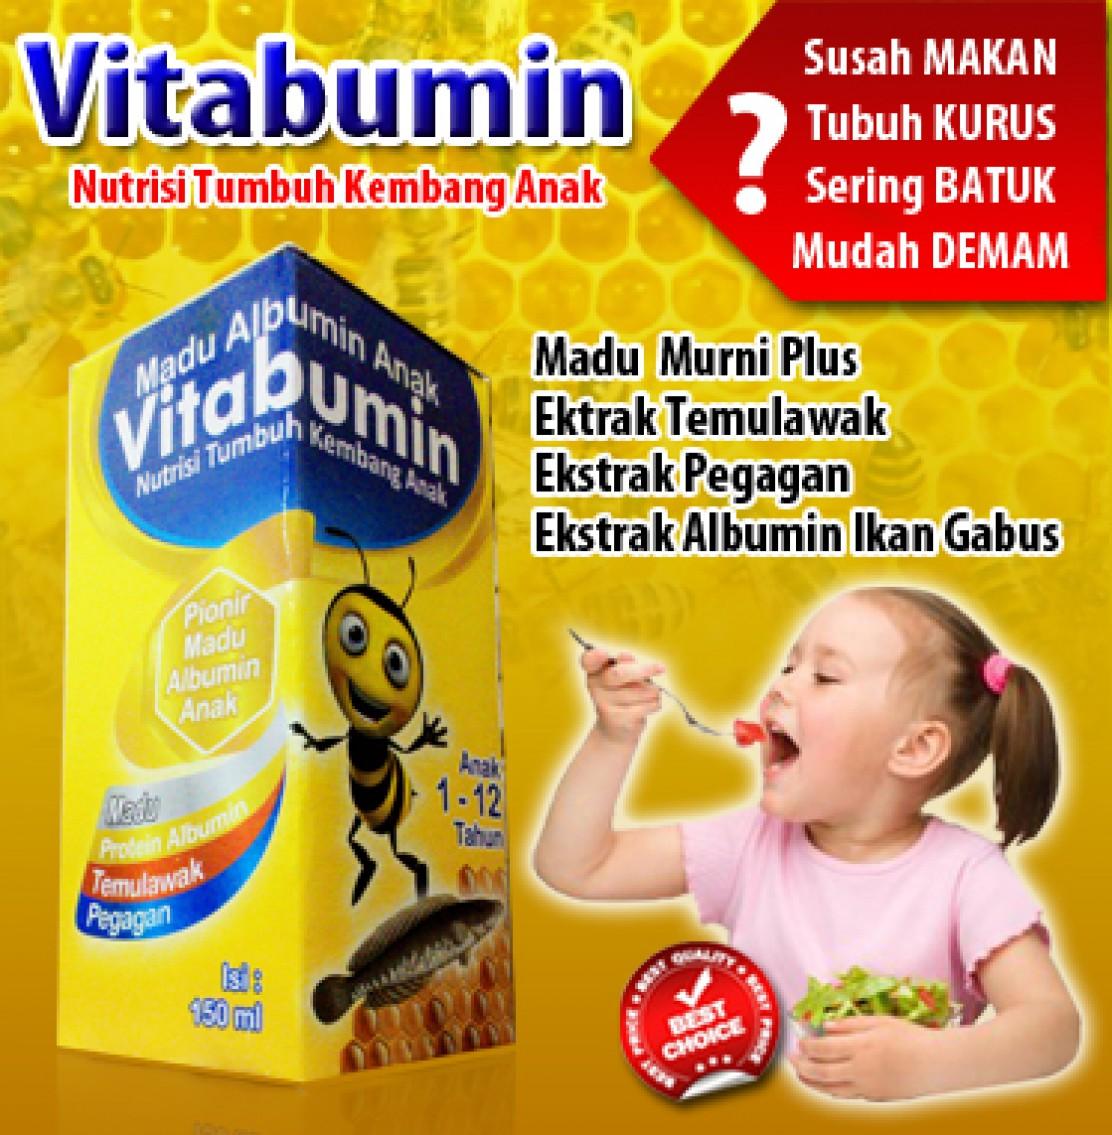 Manfaat Vitabumin